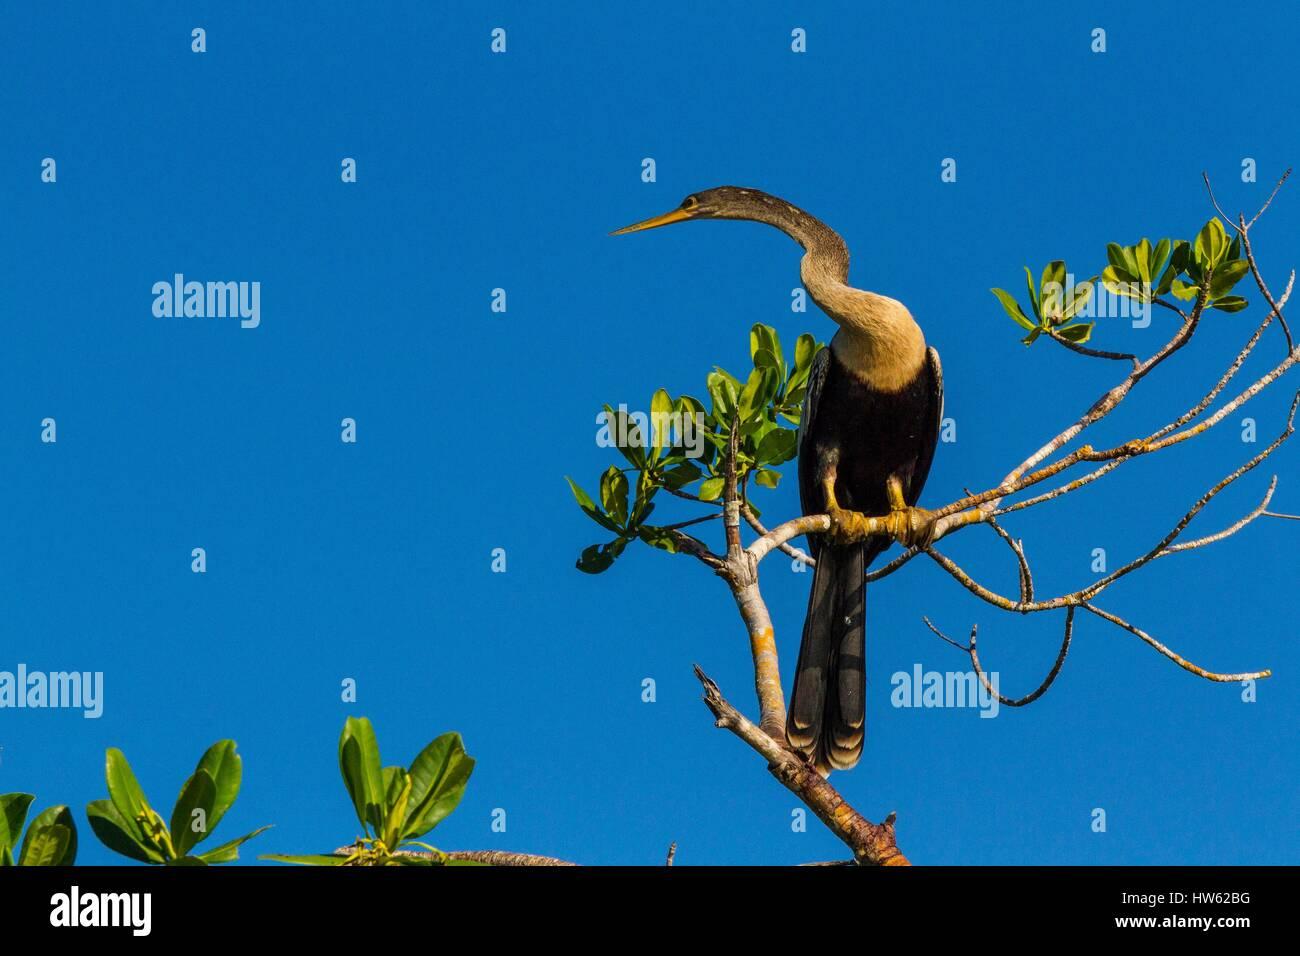 Cuba, Cienfuegos province, Cienfuegos, the Reserve Laguna de Guanaroca, snake bird, Anhinga (Anhinga anhinga) - Stock Image